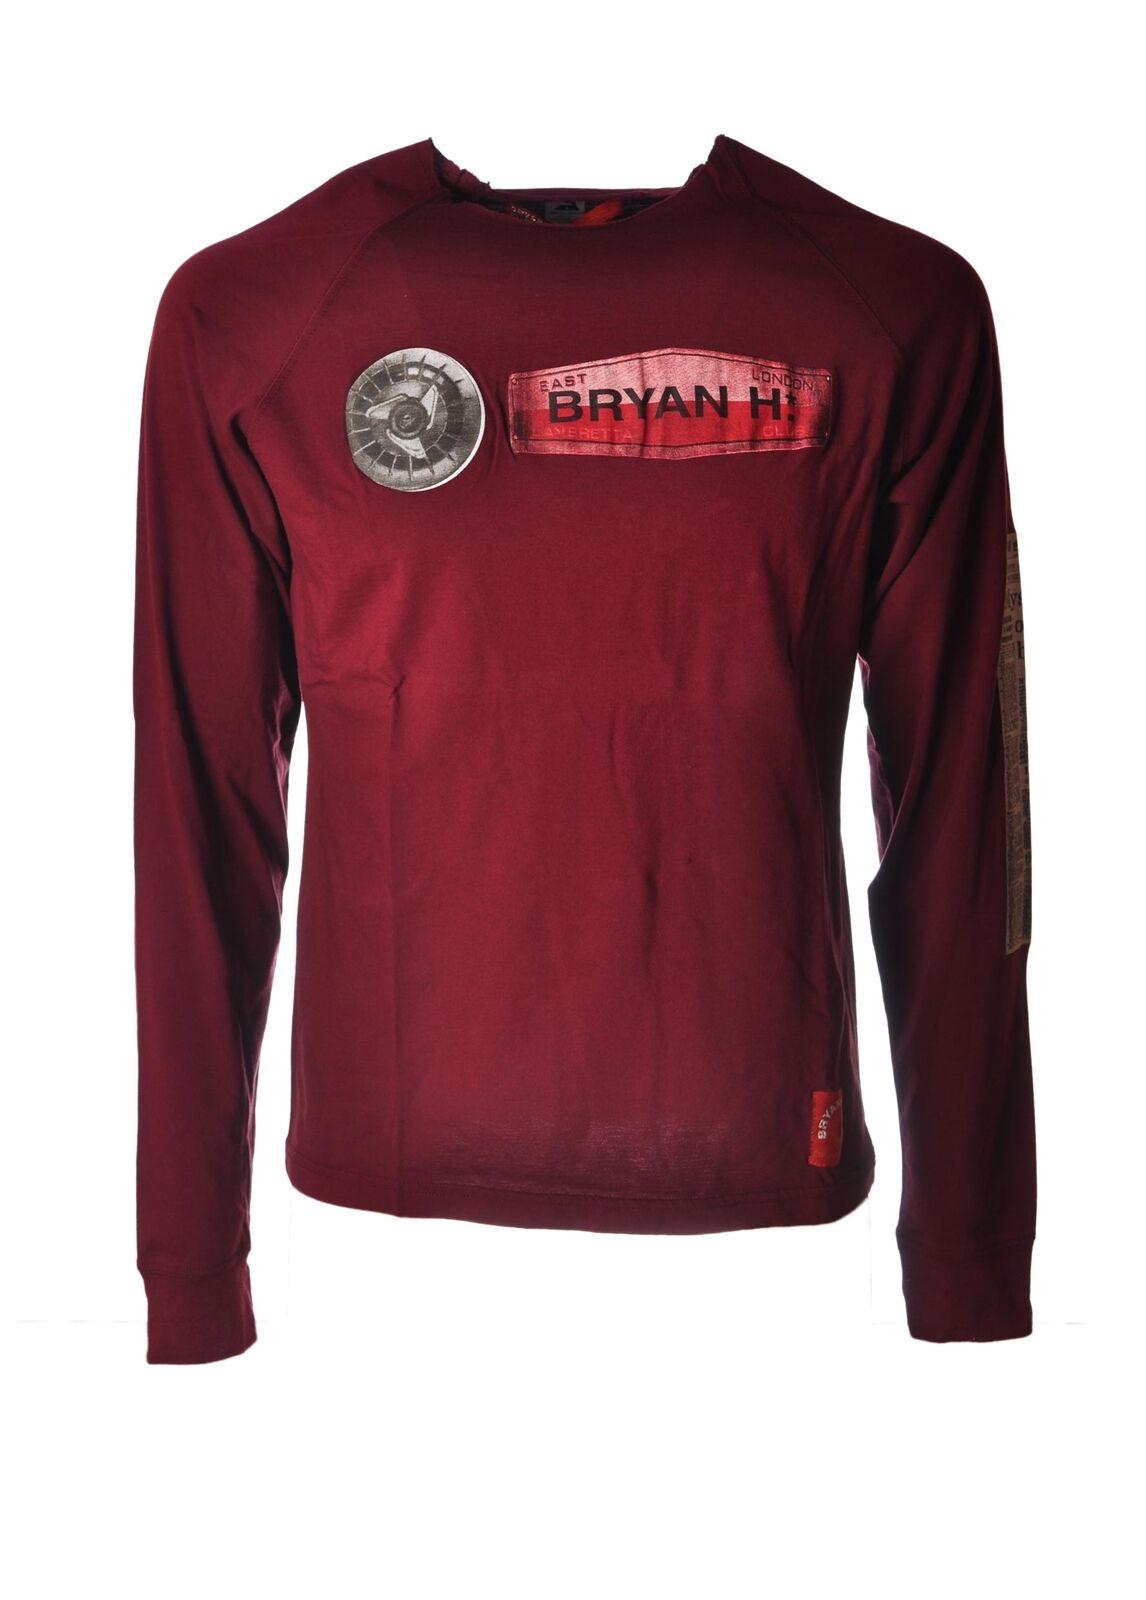 5be966a6 Bryan Husky - T Male - ROT - 4515624A184032 - noqfka807-T-Shirts ...